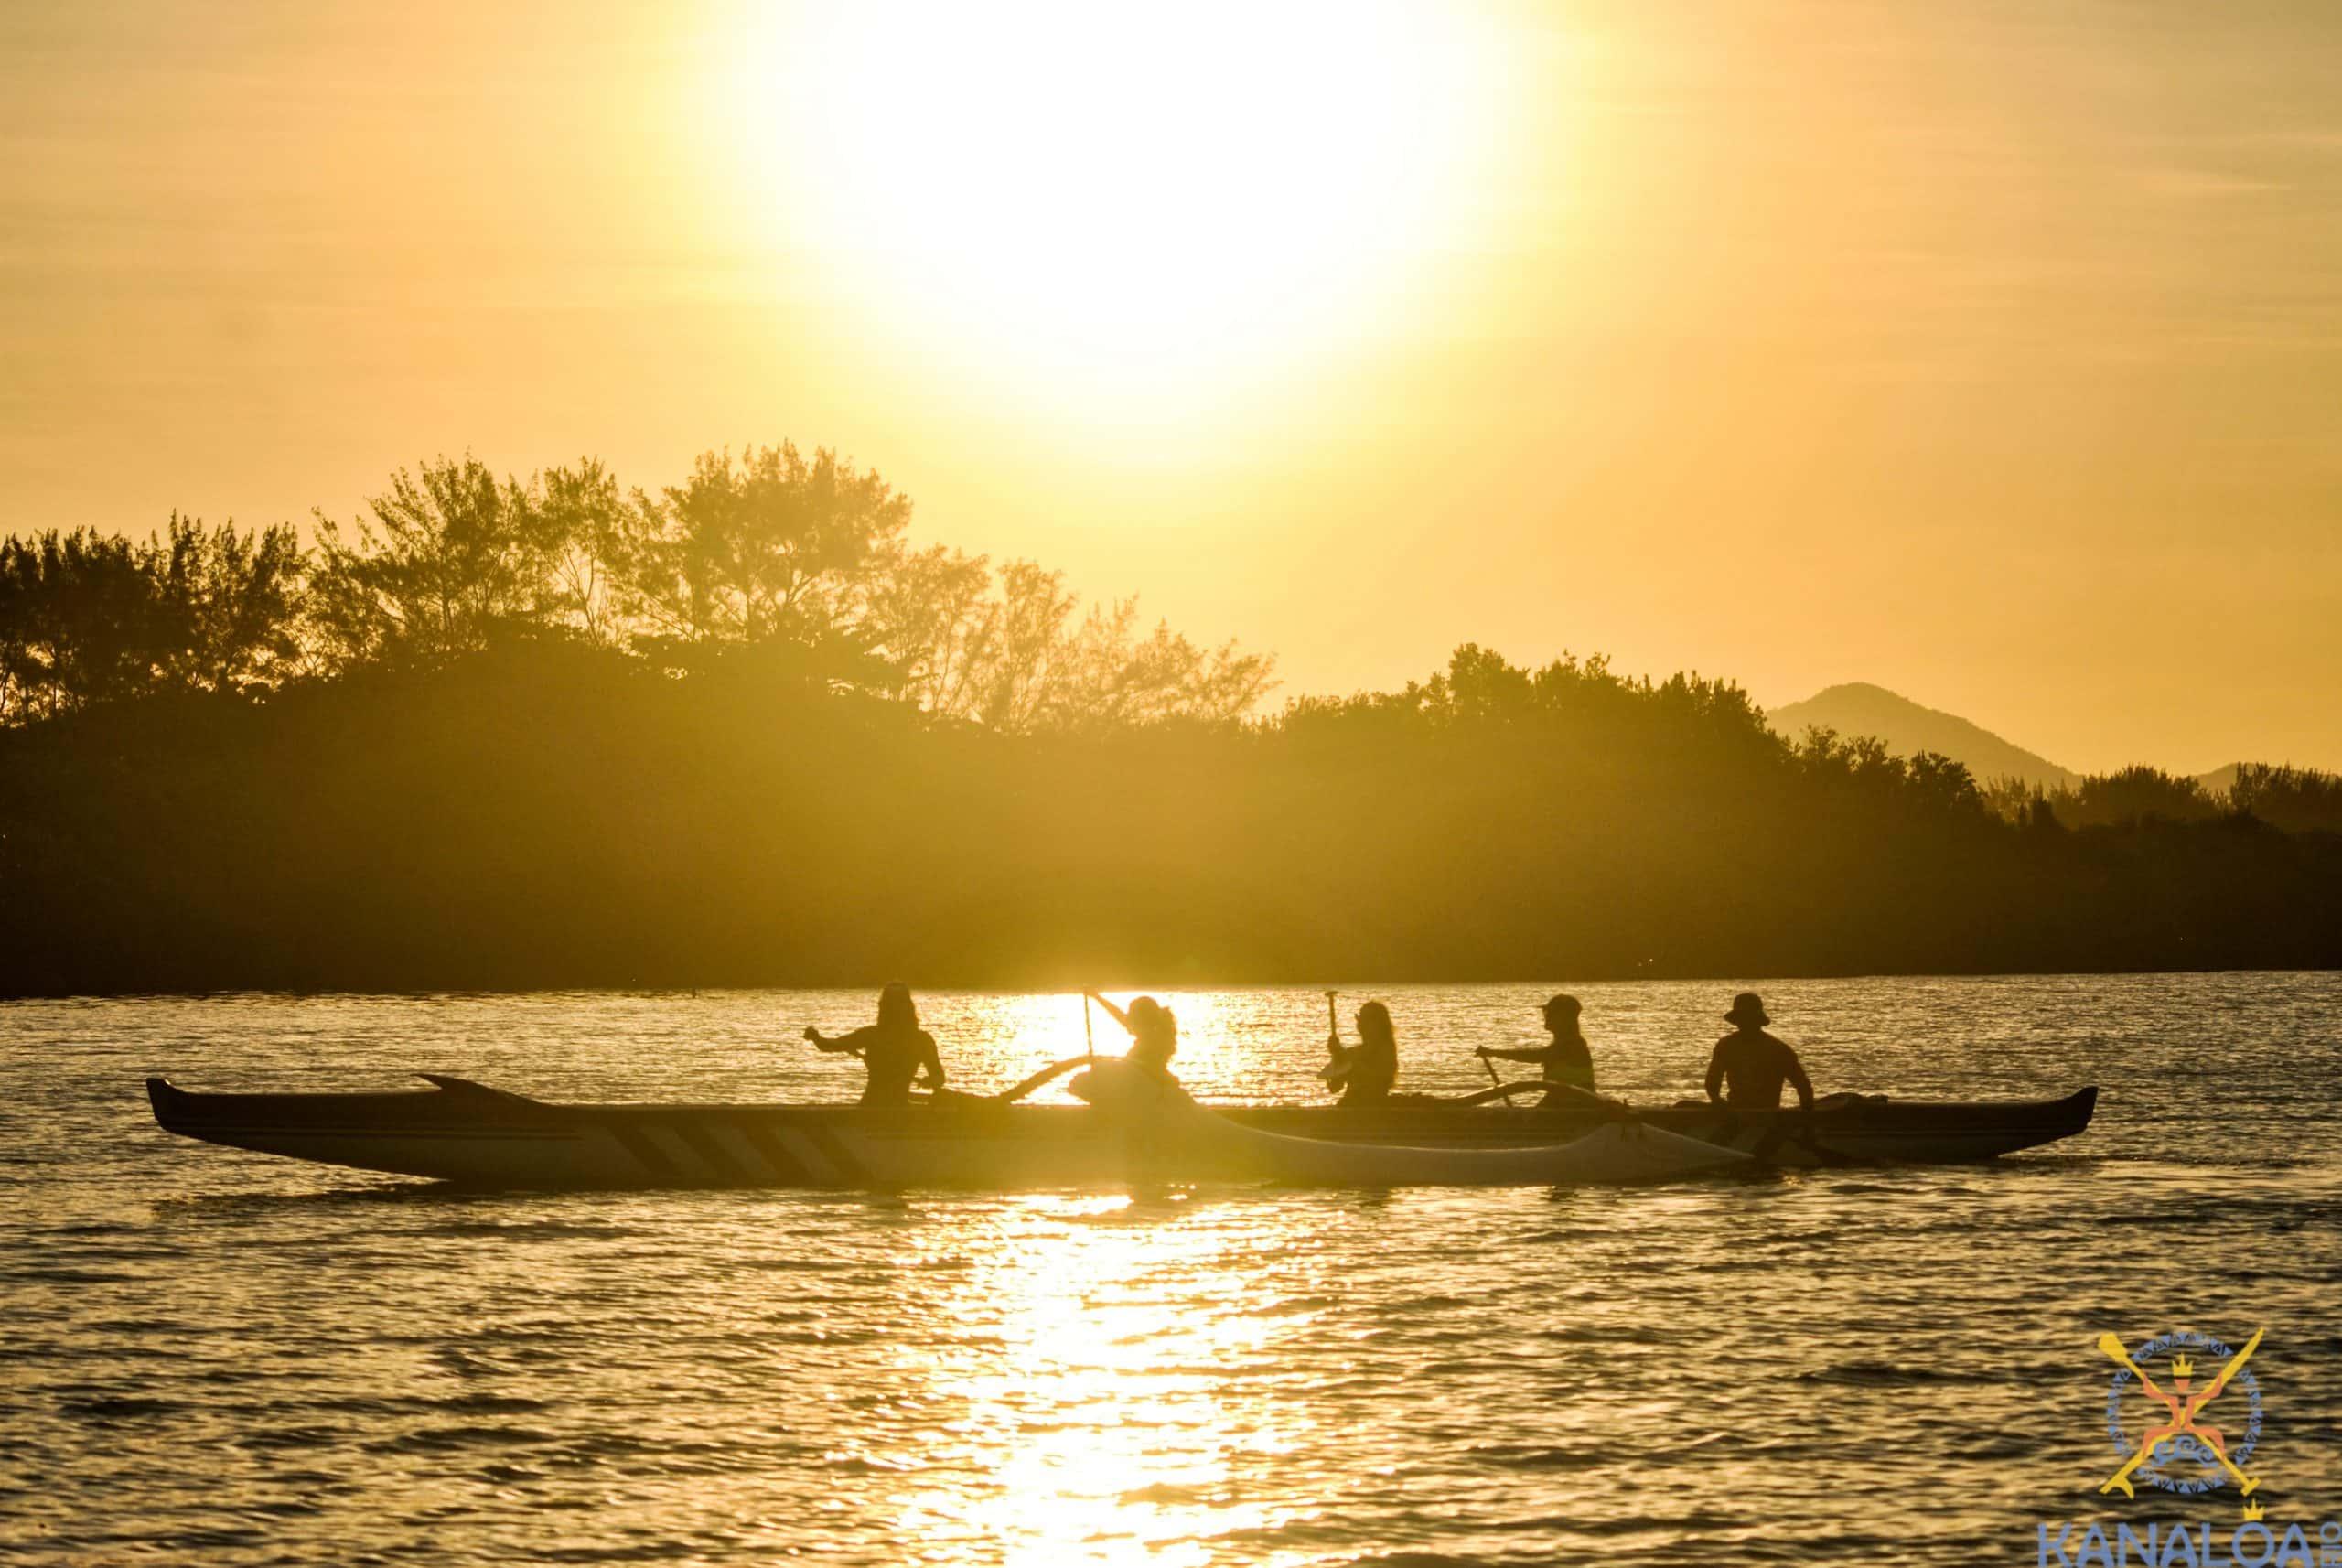 Venha remar Canoa Havaiana na Lagoa de Marapendi